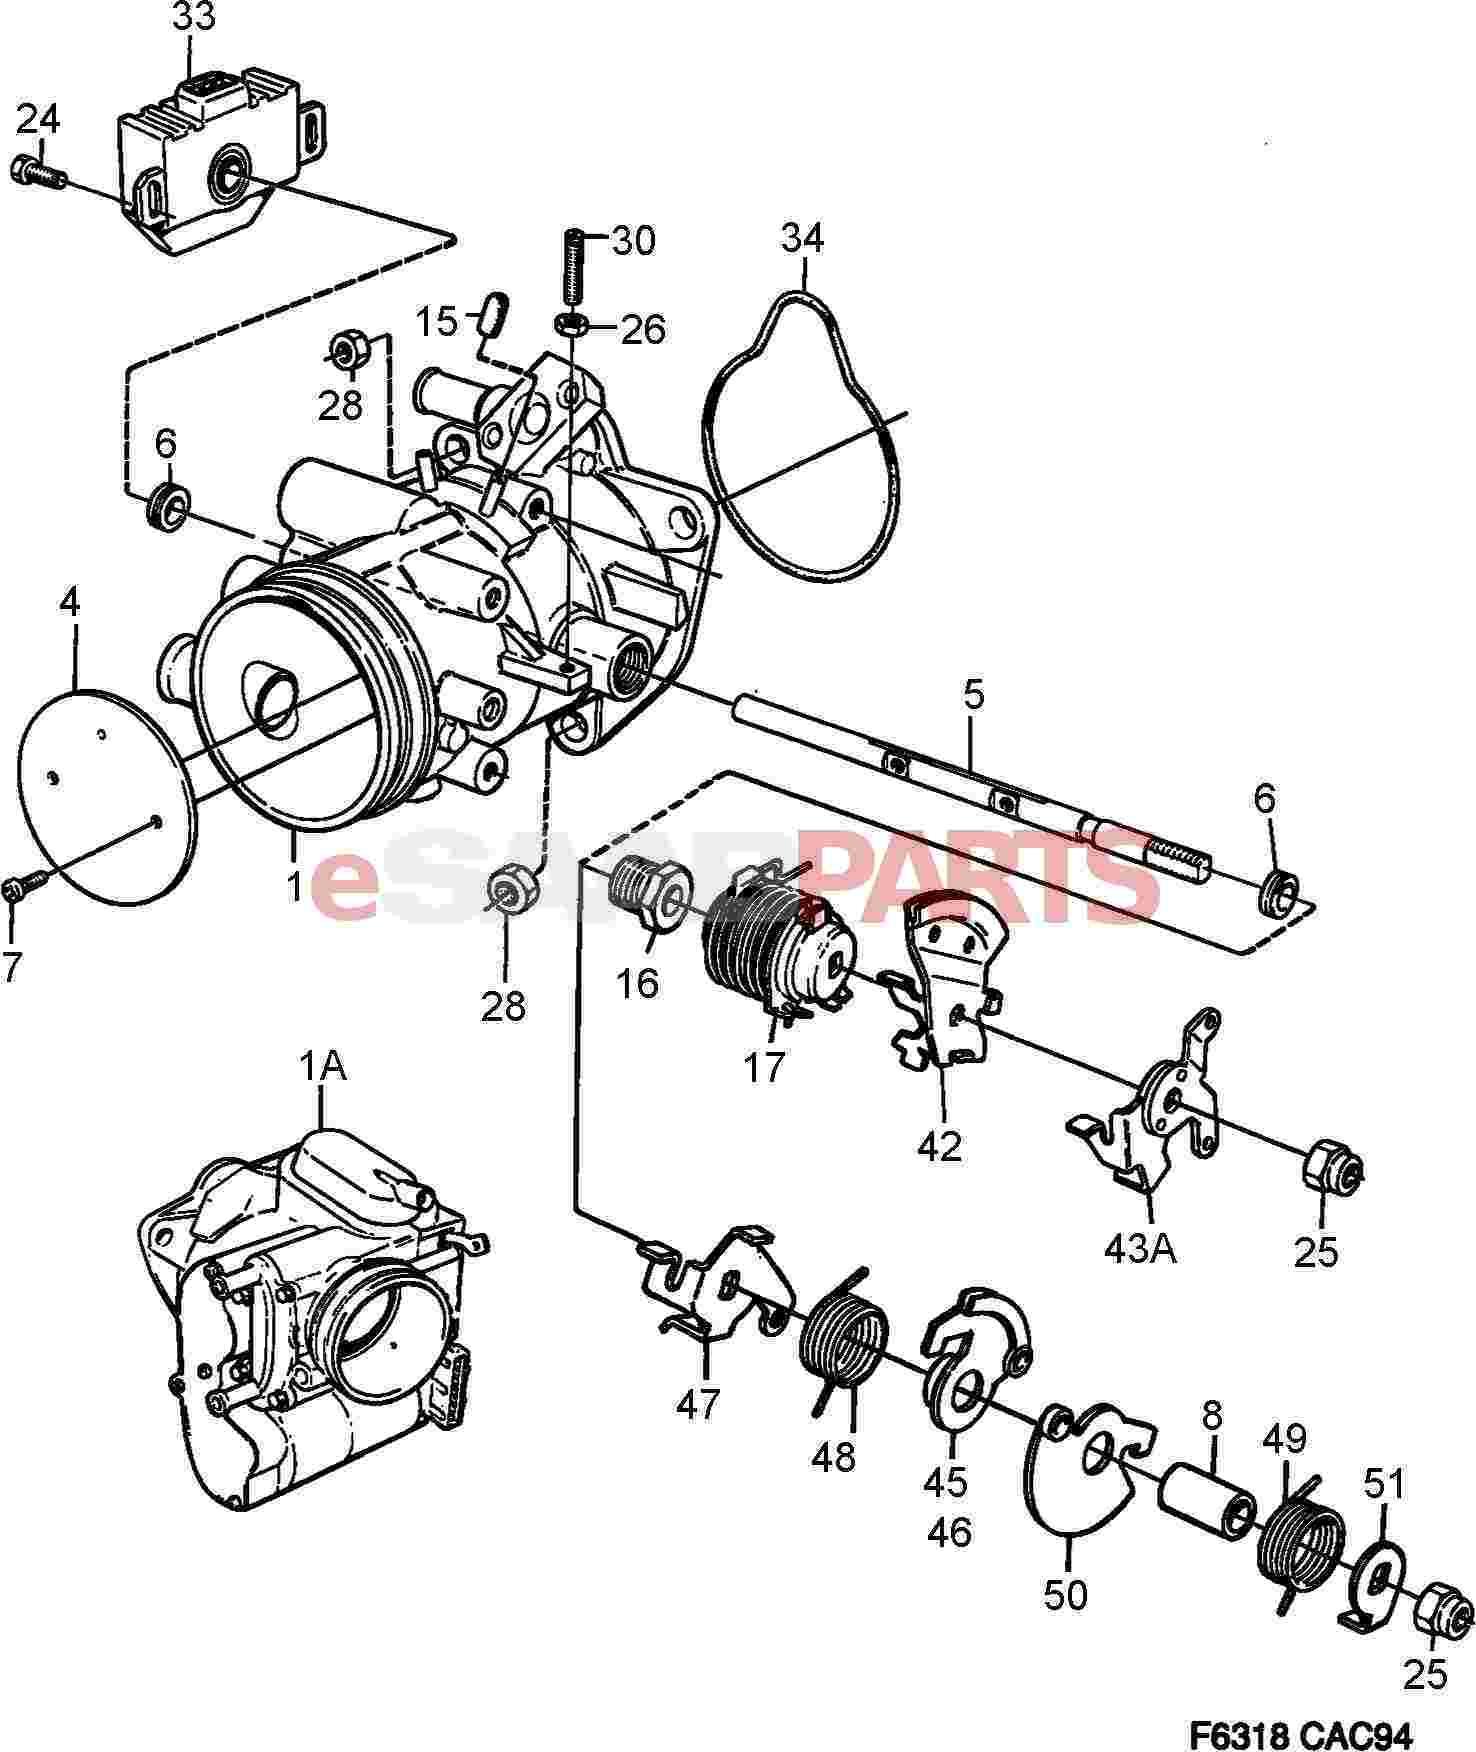 saab 9 3 engine diagram 2001 ford explorer sport trac fuse box 9000 wiring diagrams